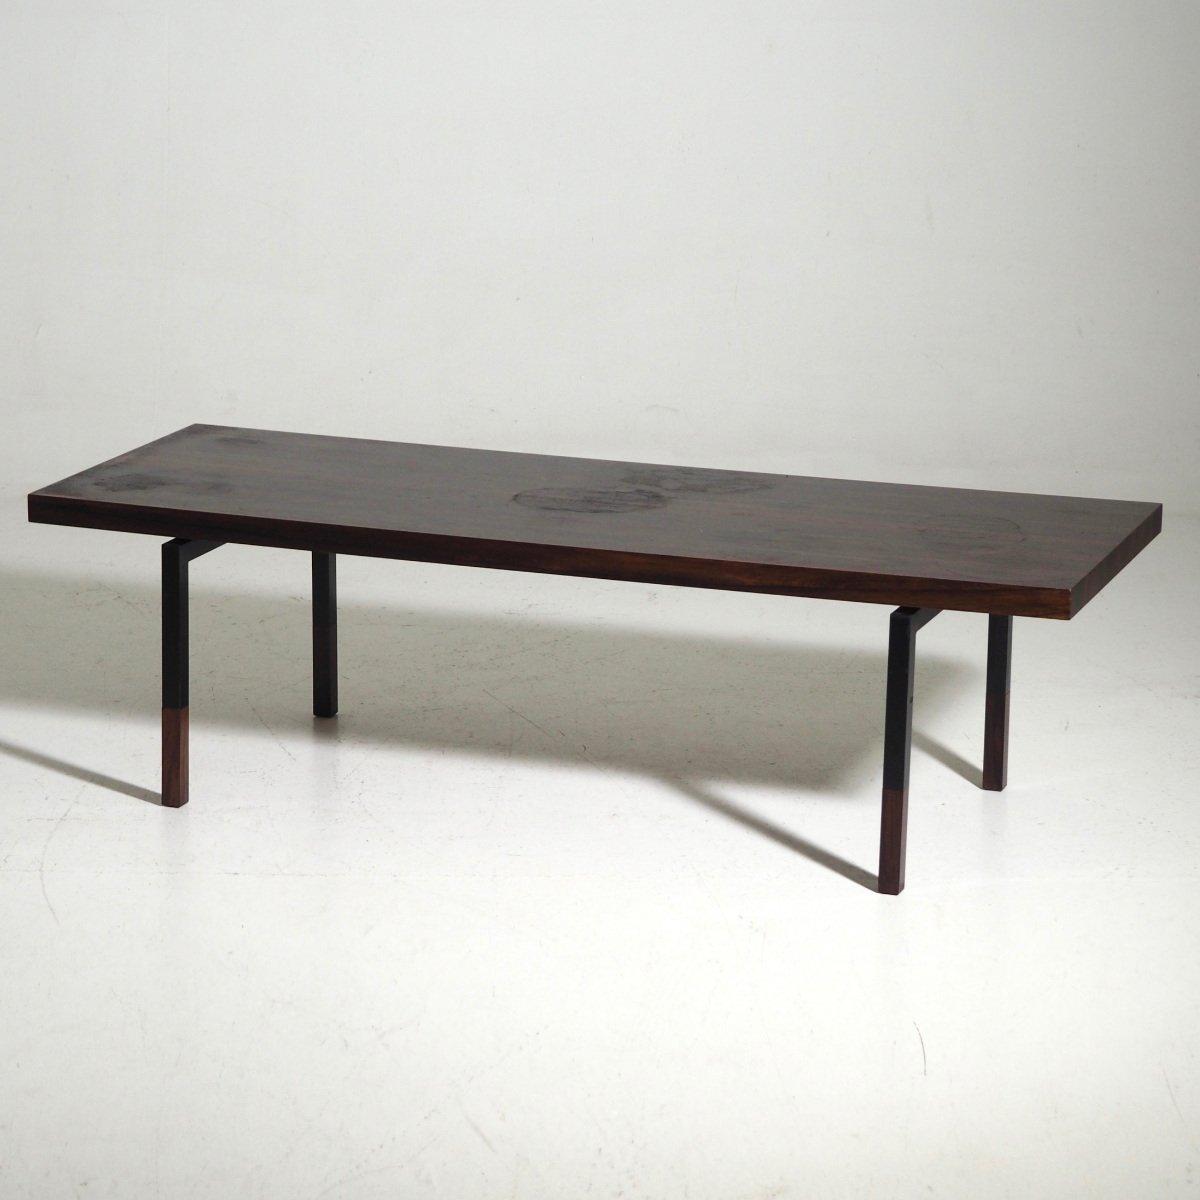 Rosewood & Steel Coffee Table, 1960s